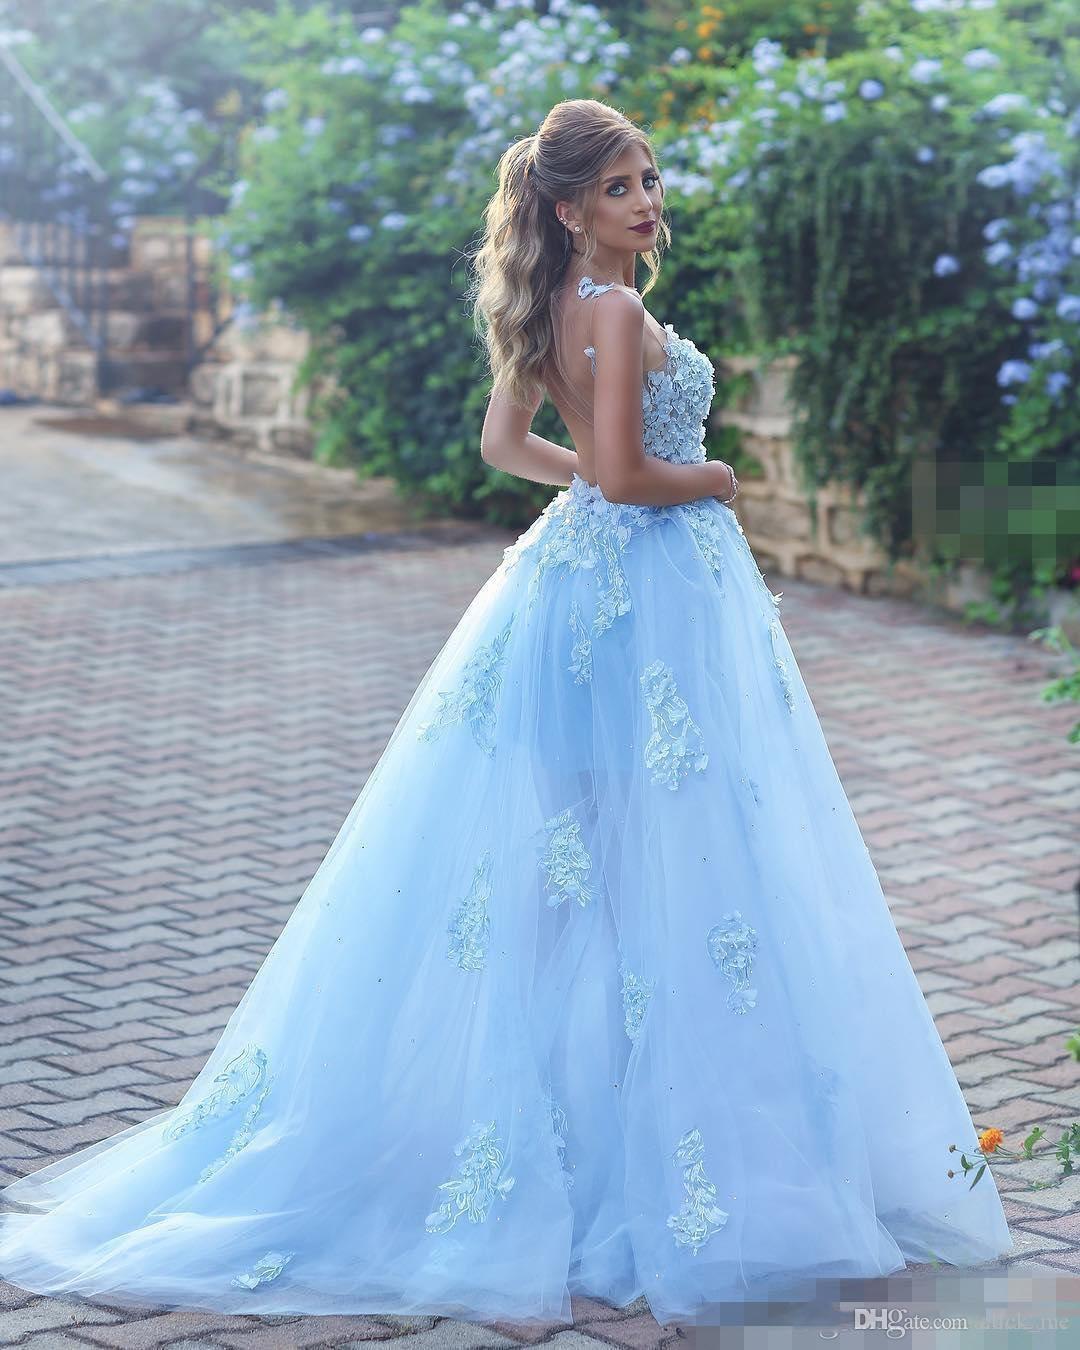 Sky Blue Princess Prom Kleider Lange Sheer Ausschnitt Spitze Appliques Tüll A Line Promi Abendkleider Sheer Zurück Sexy Party Kleider